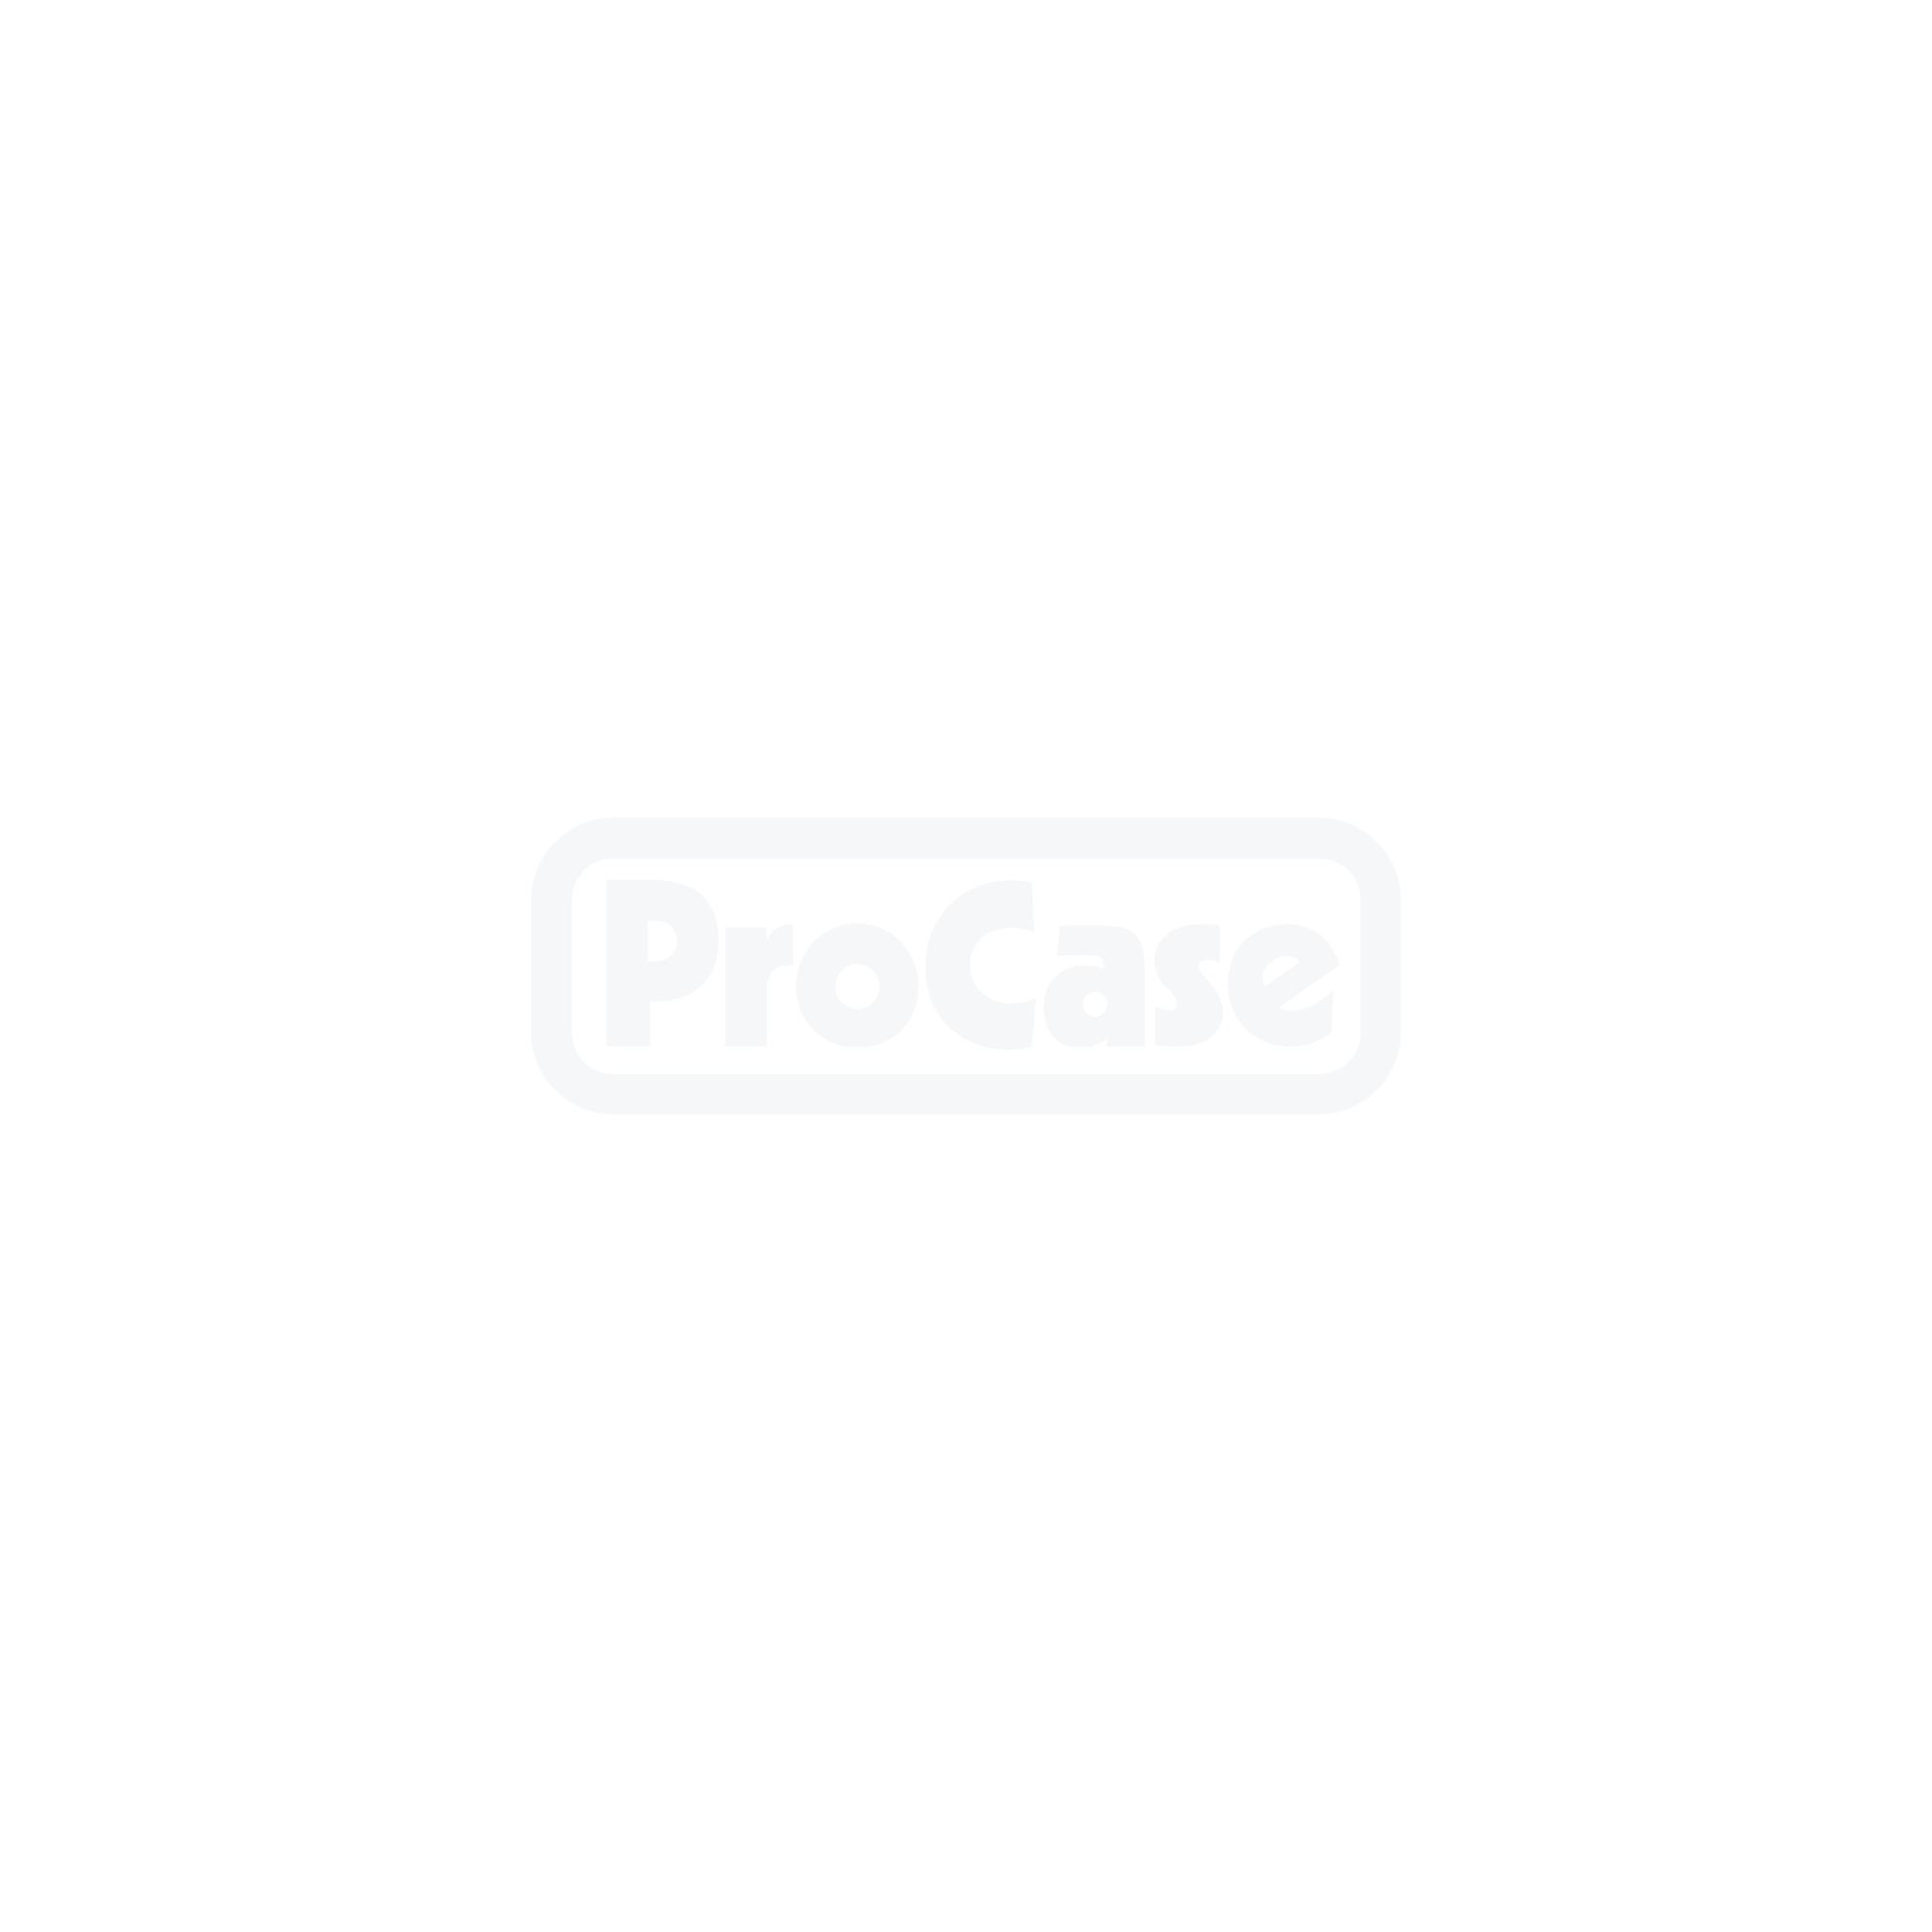 SKB 3i Koffer 1309-6B mit Rasterschaumstoff